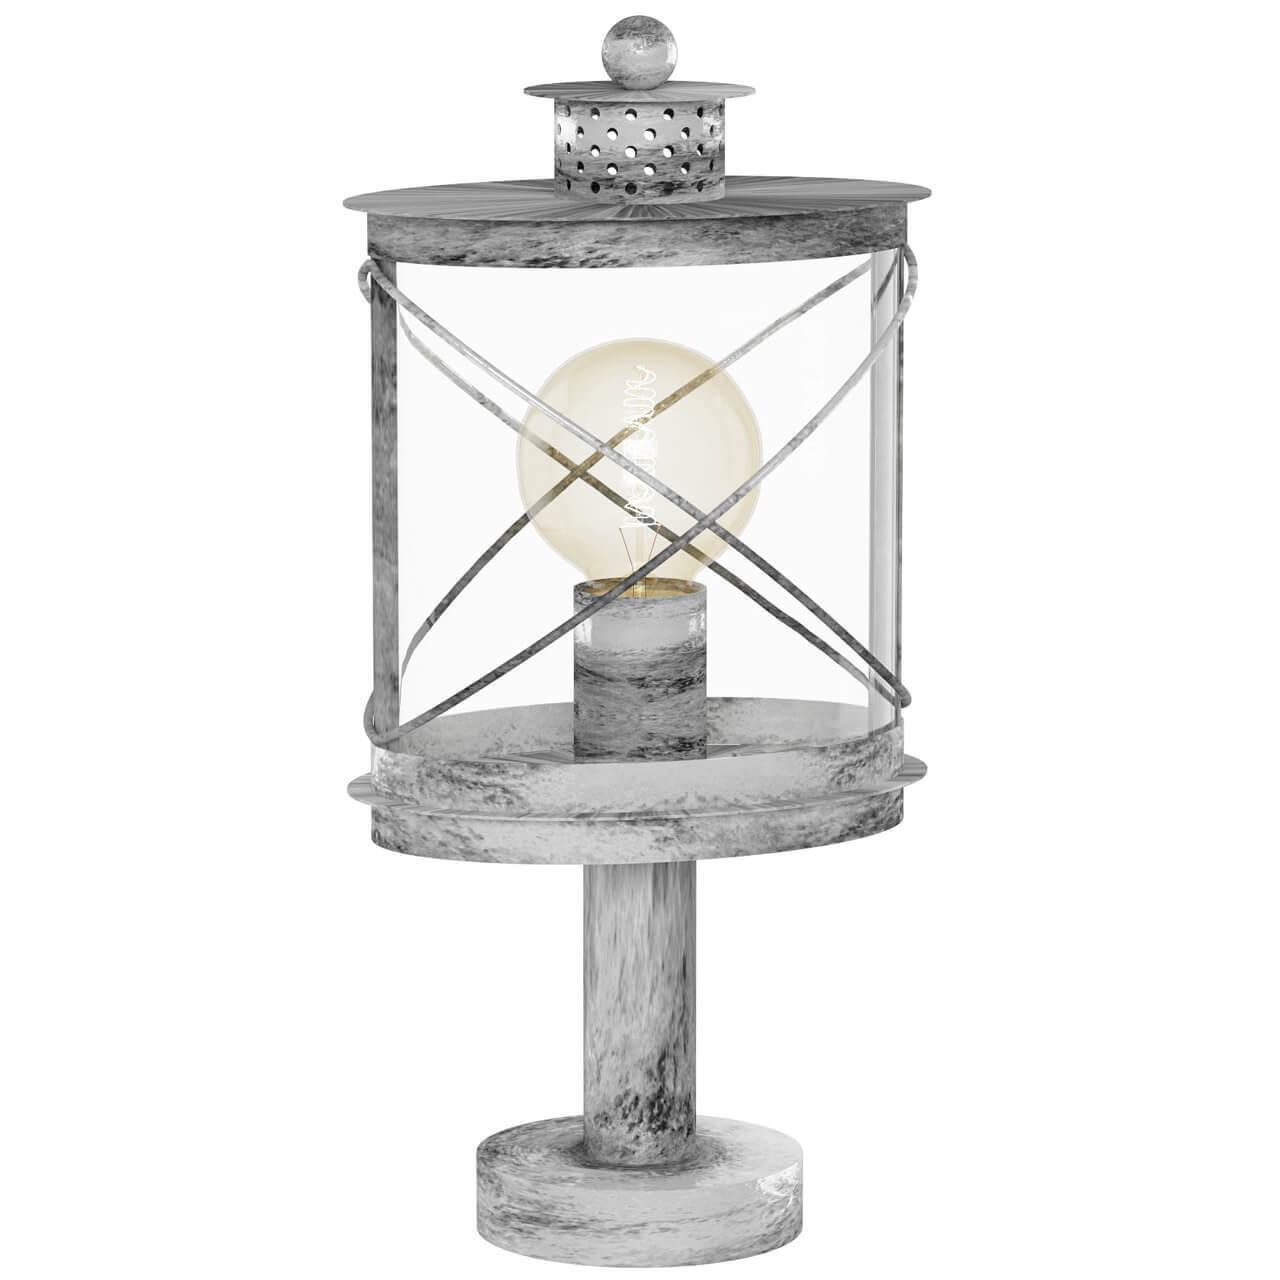 Светильник Eglo 94867 Hilburn eglo светильник уличный hilburn 94843